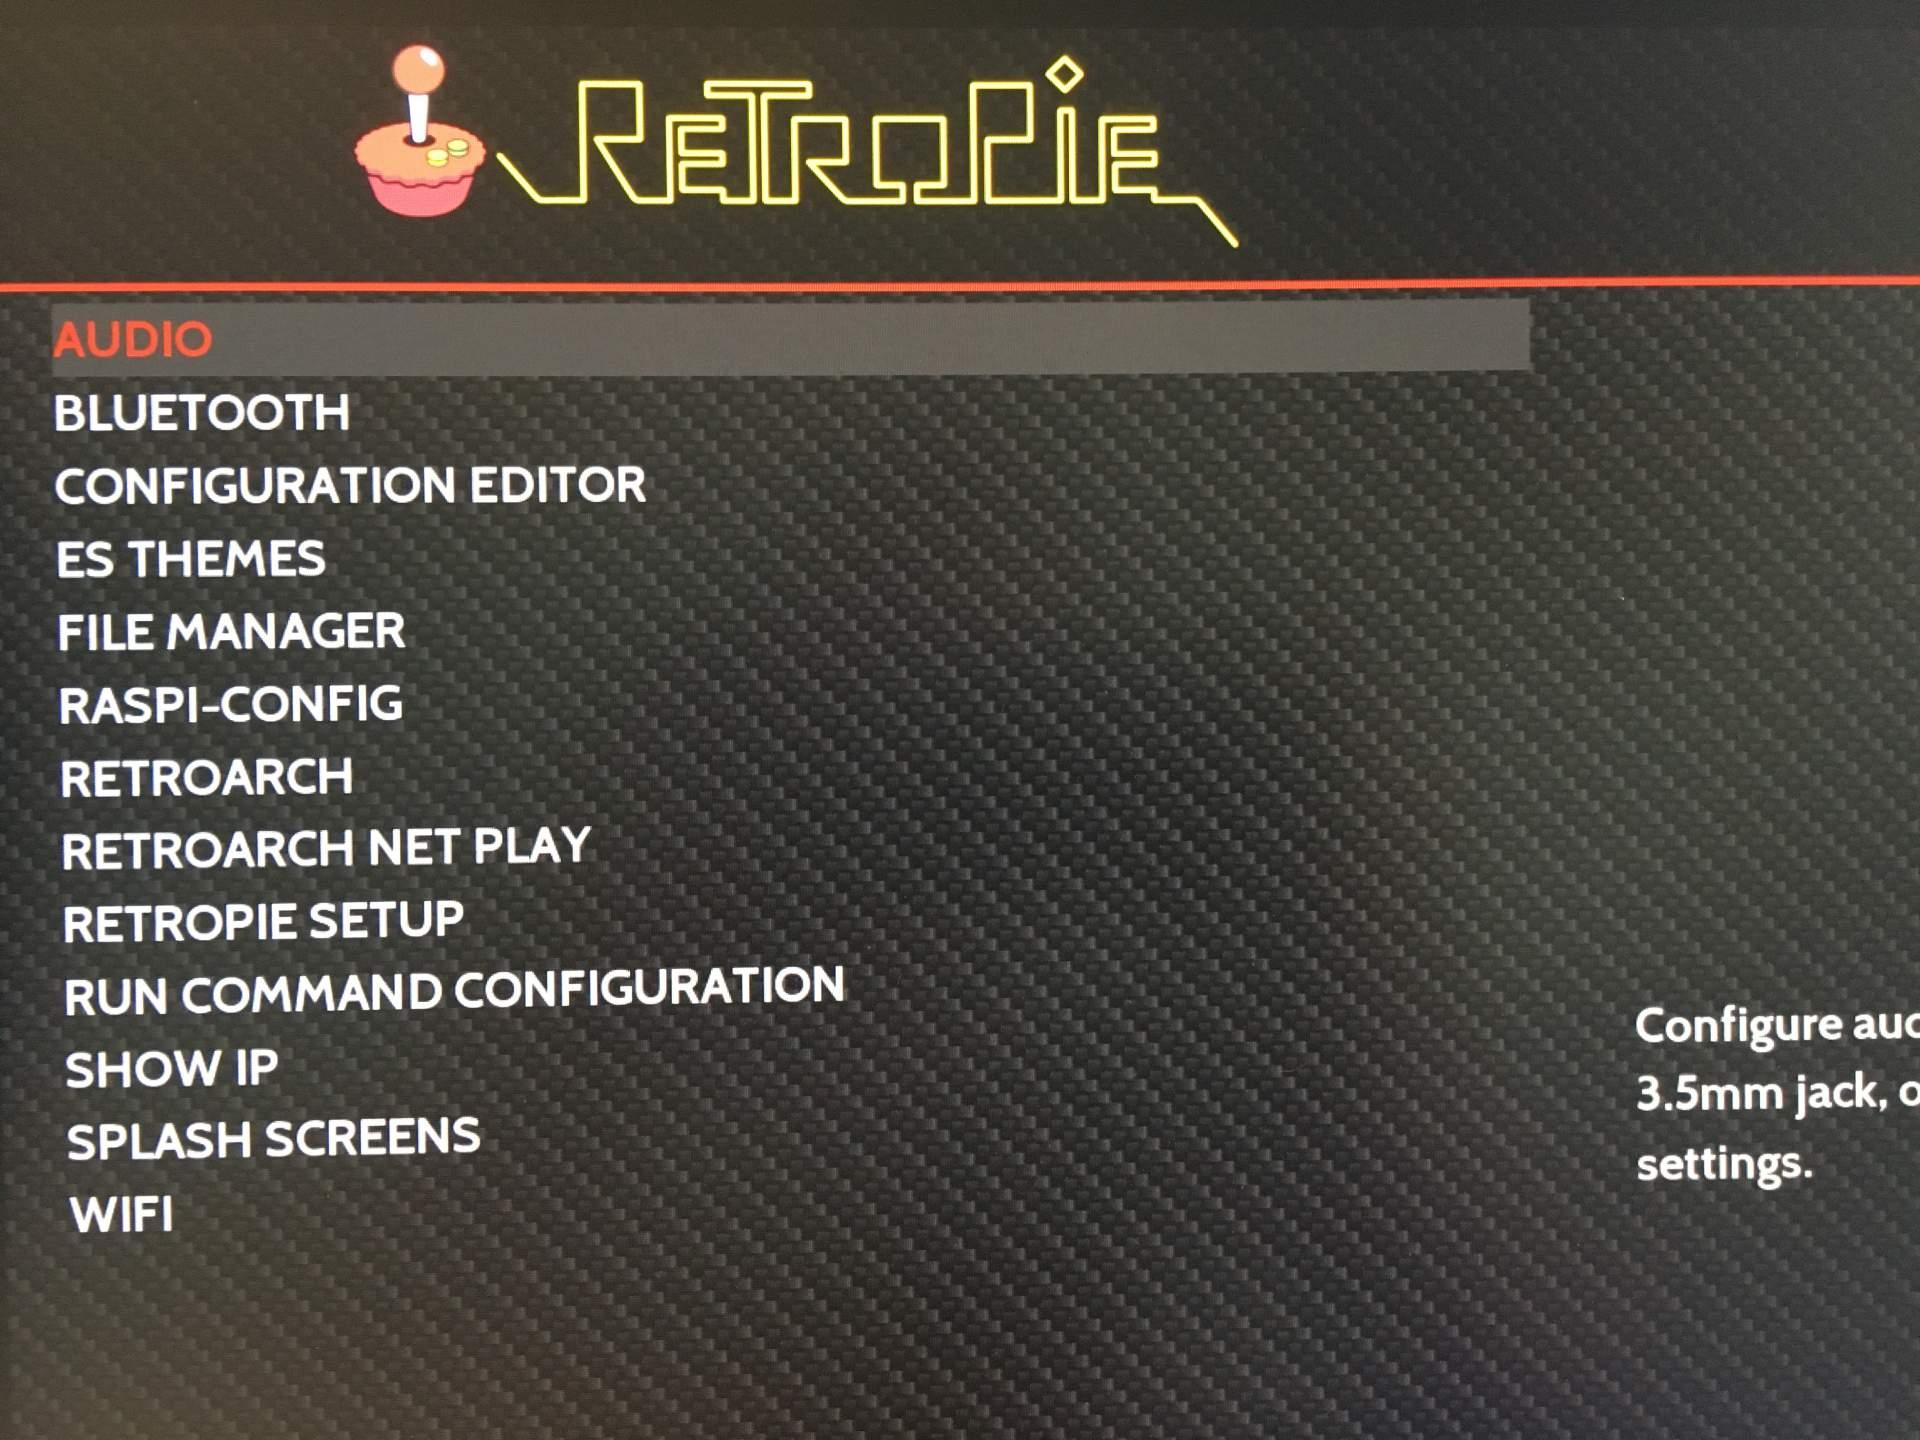 Das RetroPie-Hauptmenü.